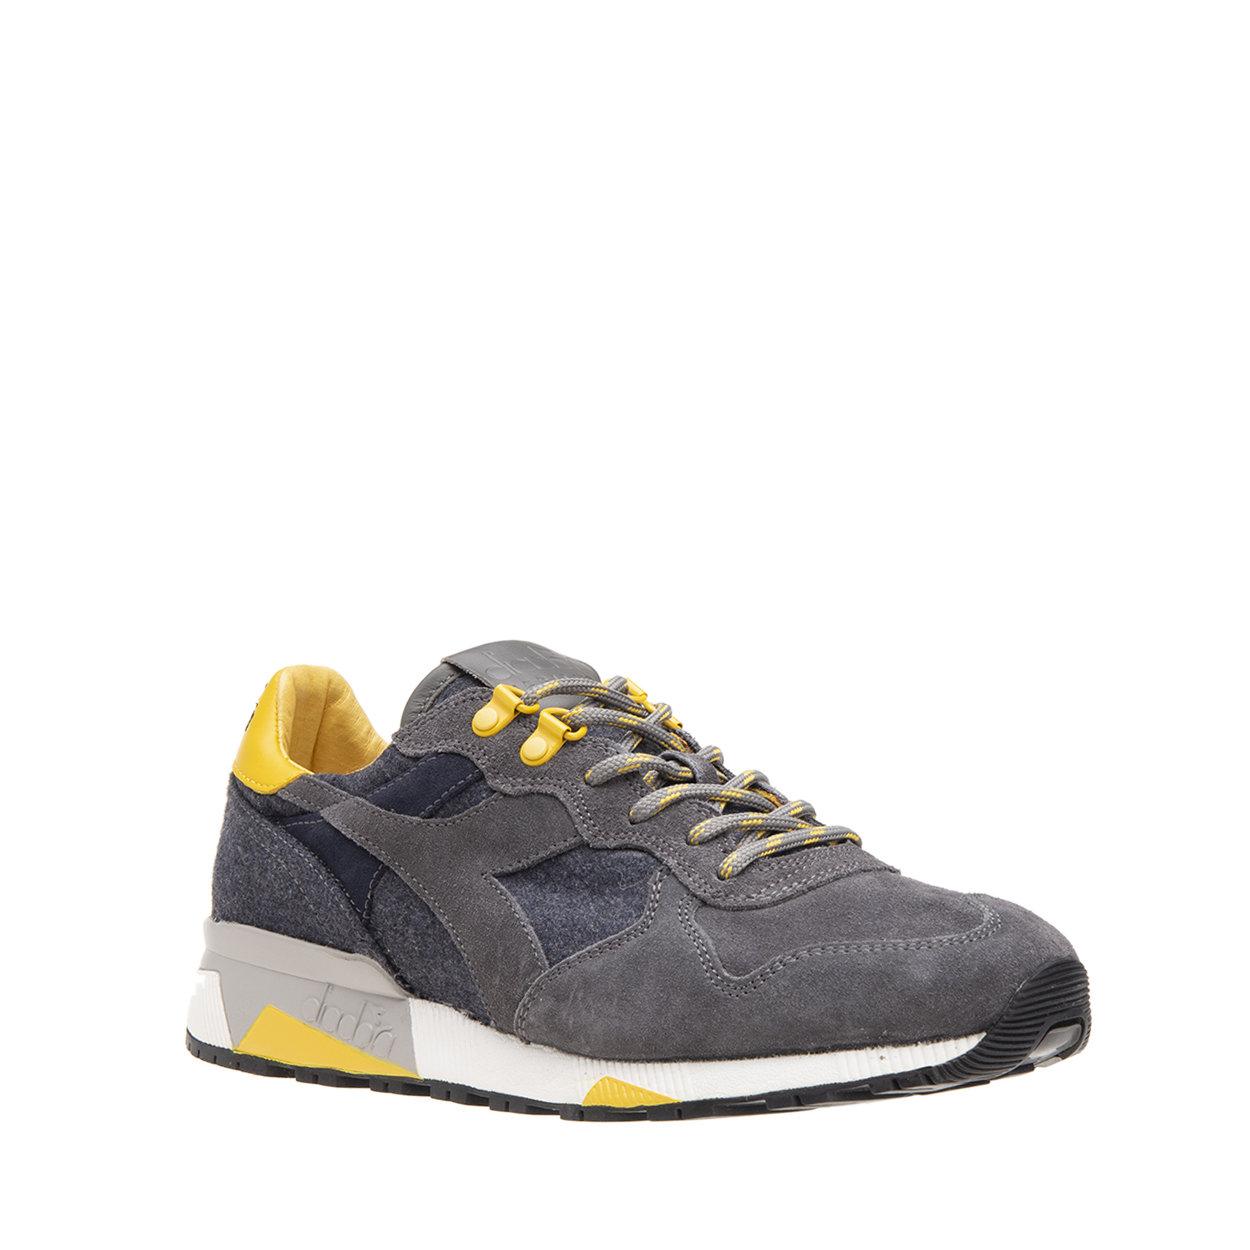 Sneakers Diadora Run 90 da uomo, grigio DIADORA Acquista su Ventis.